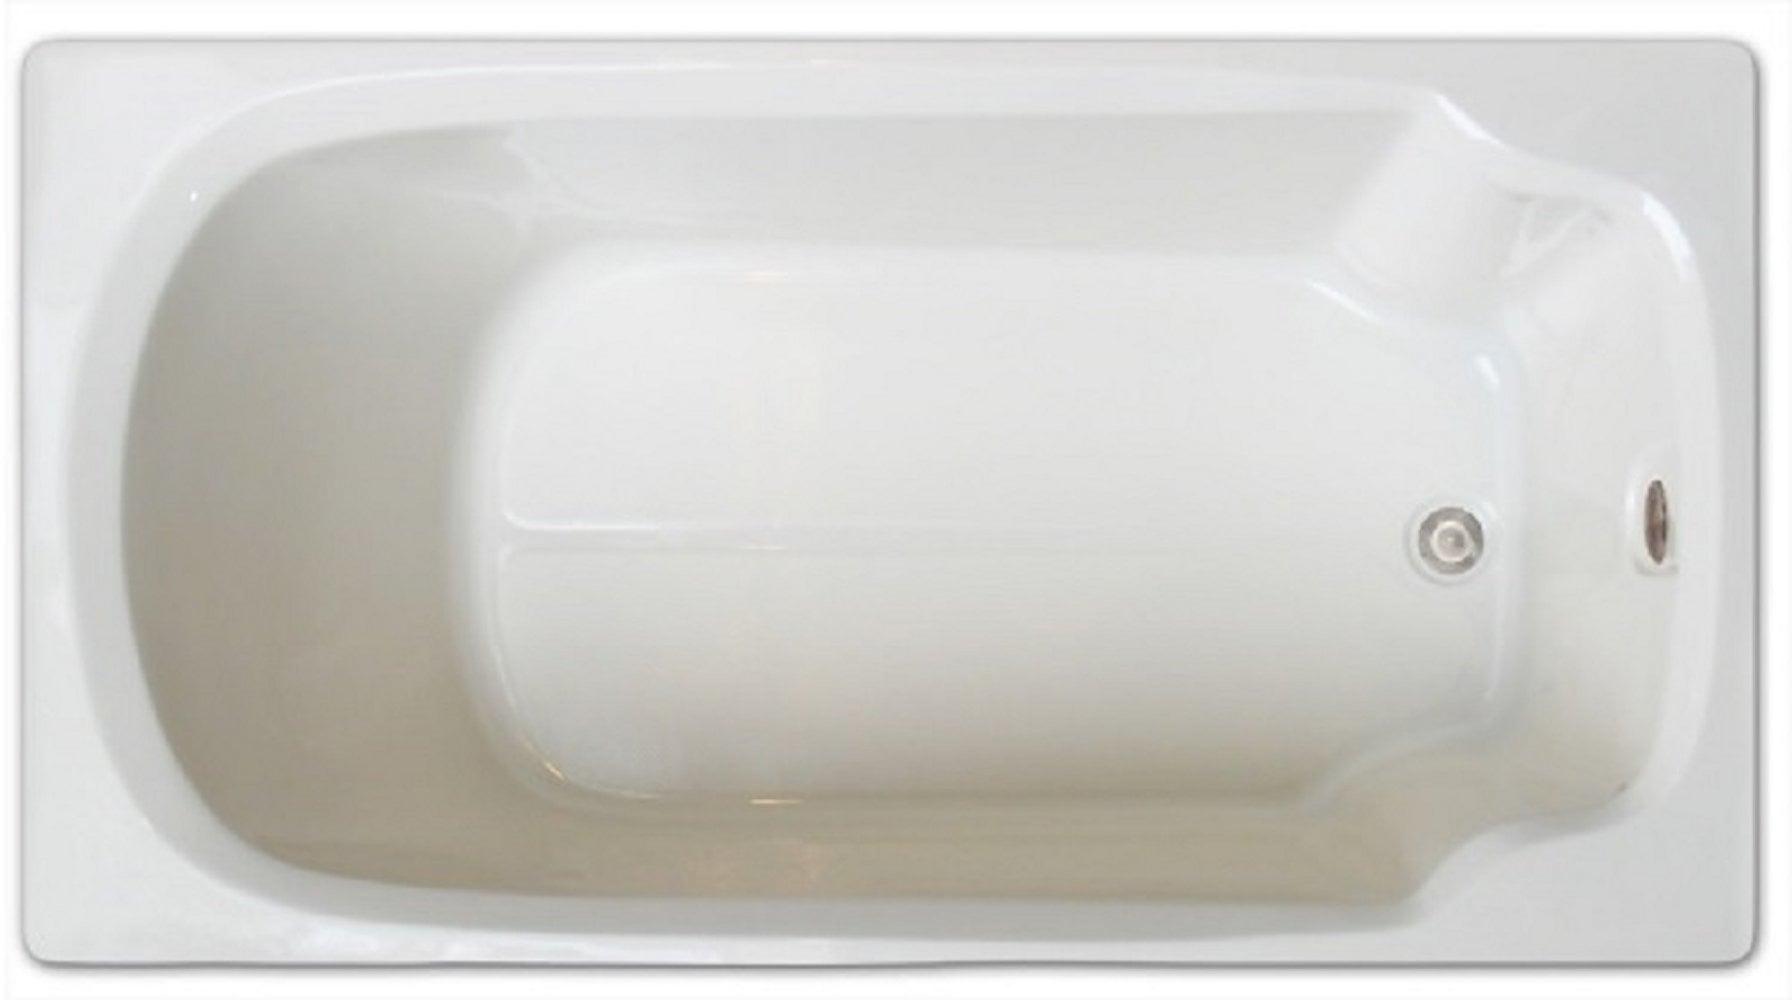 Drop-in Bathtub / 60x32x17.5 / high gloss white acrylic / Rectangle / LPI13-S Pinnacle Bath - Soaker 0